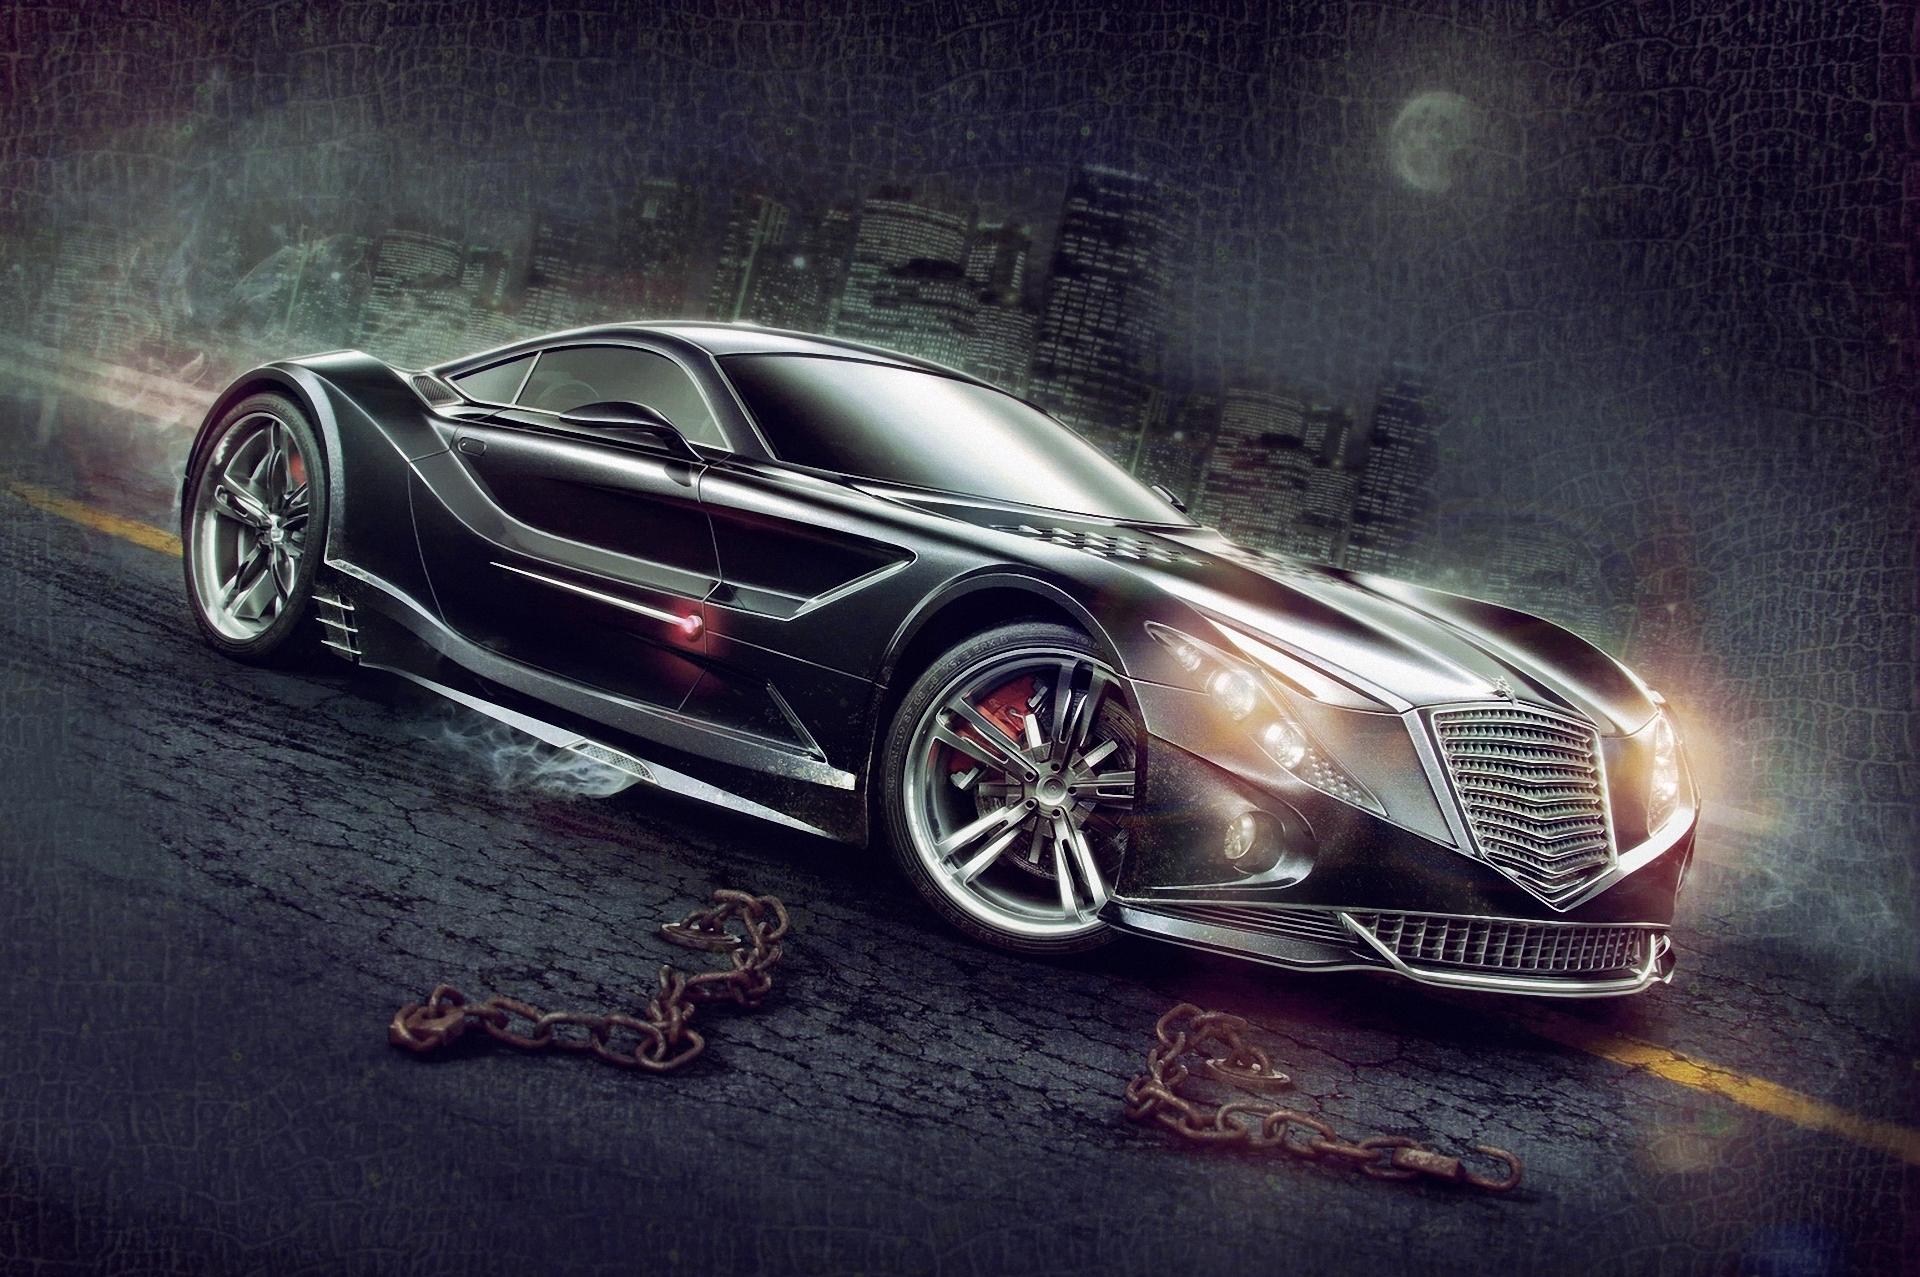 cars exotic supercars wallpaper - photo #1